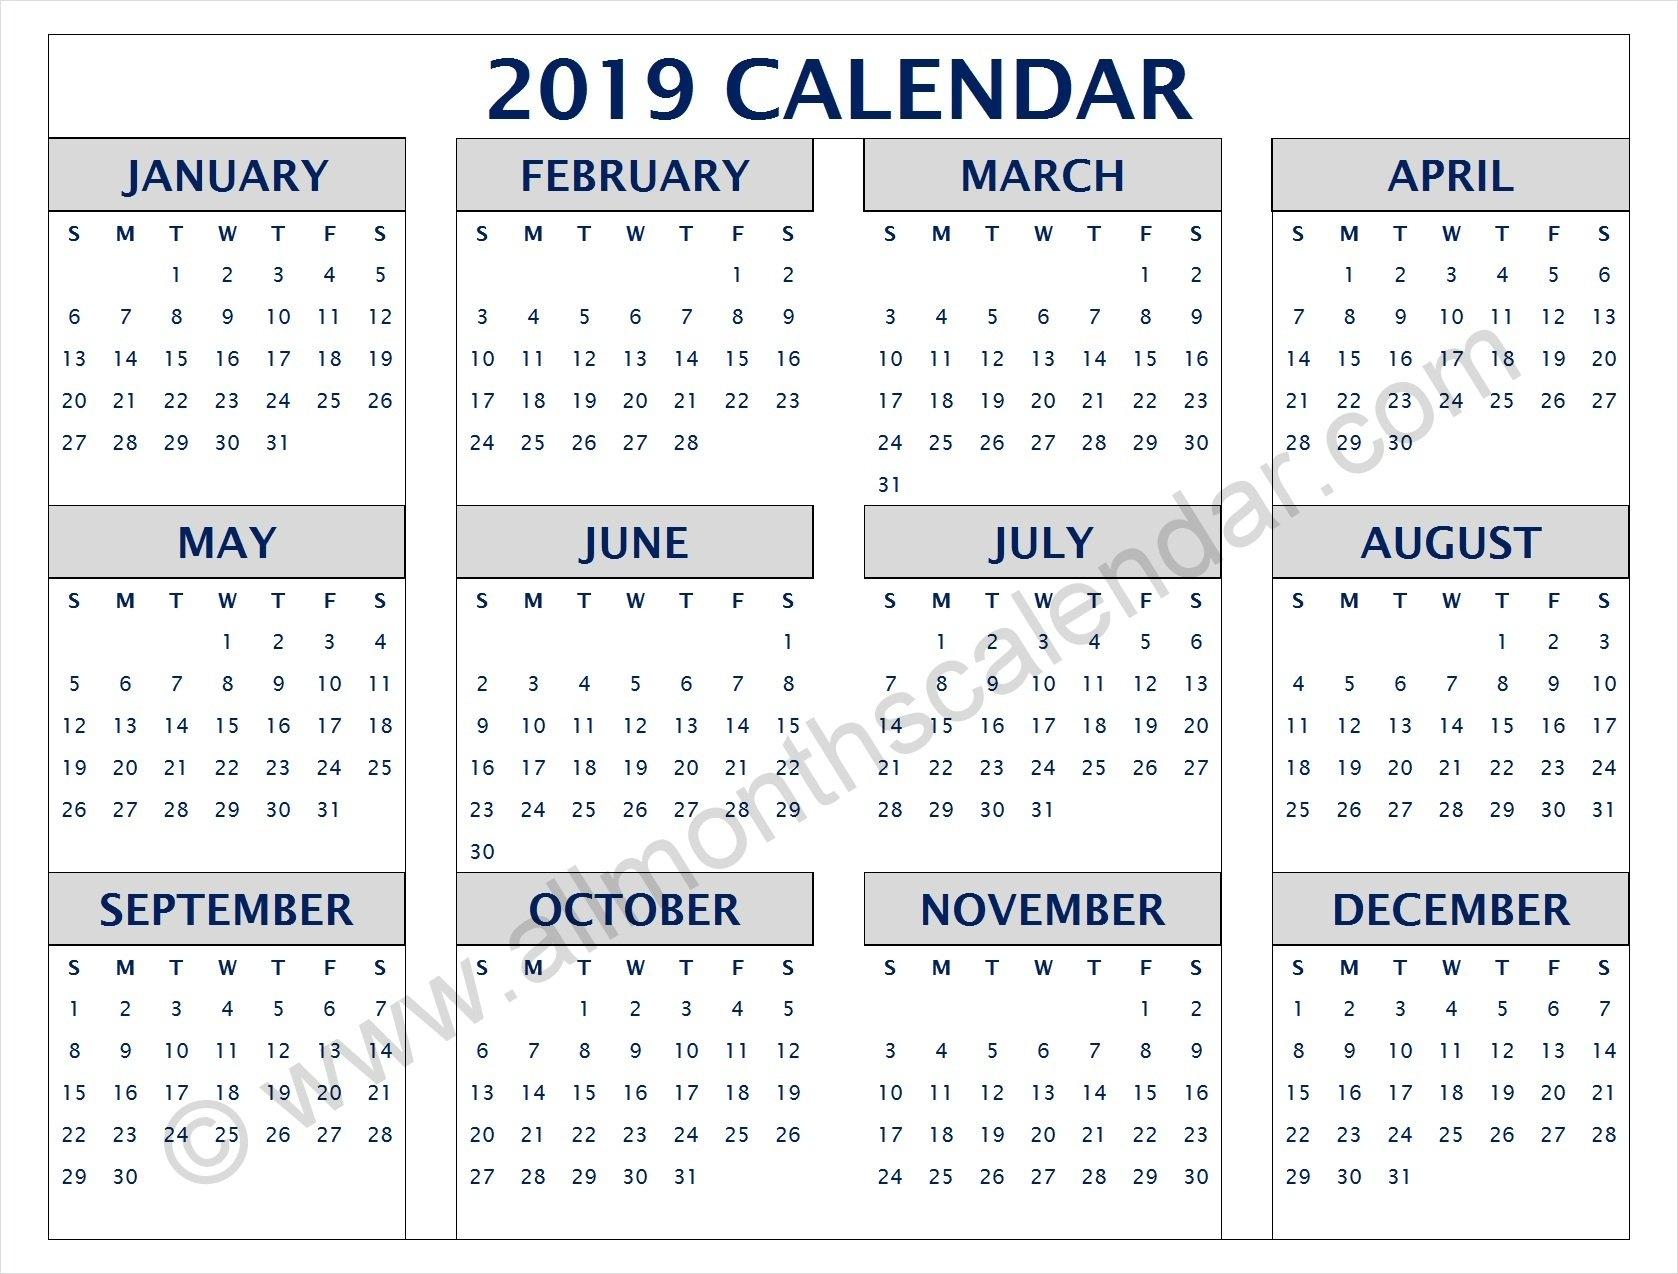 Yearly 2019 Calendar Pdf | 12 Month 2019 Calendar Printable Calendar 2019 Pdf